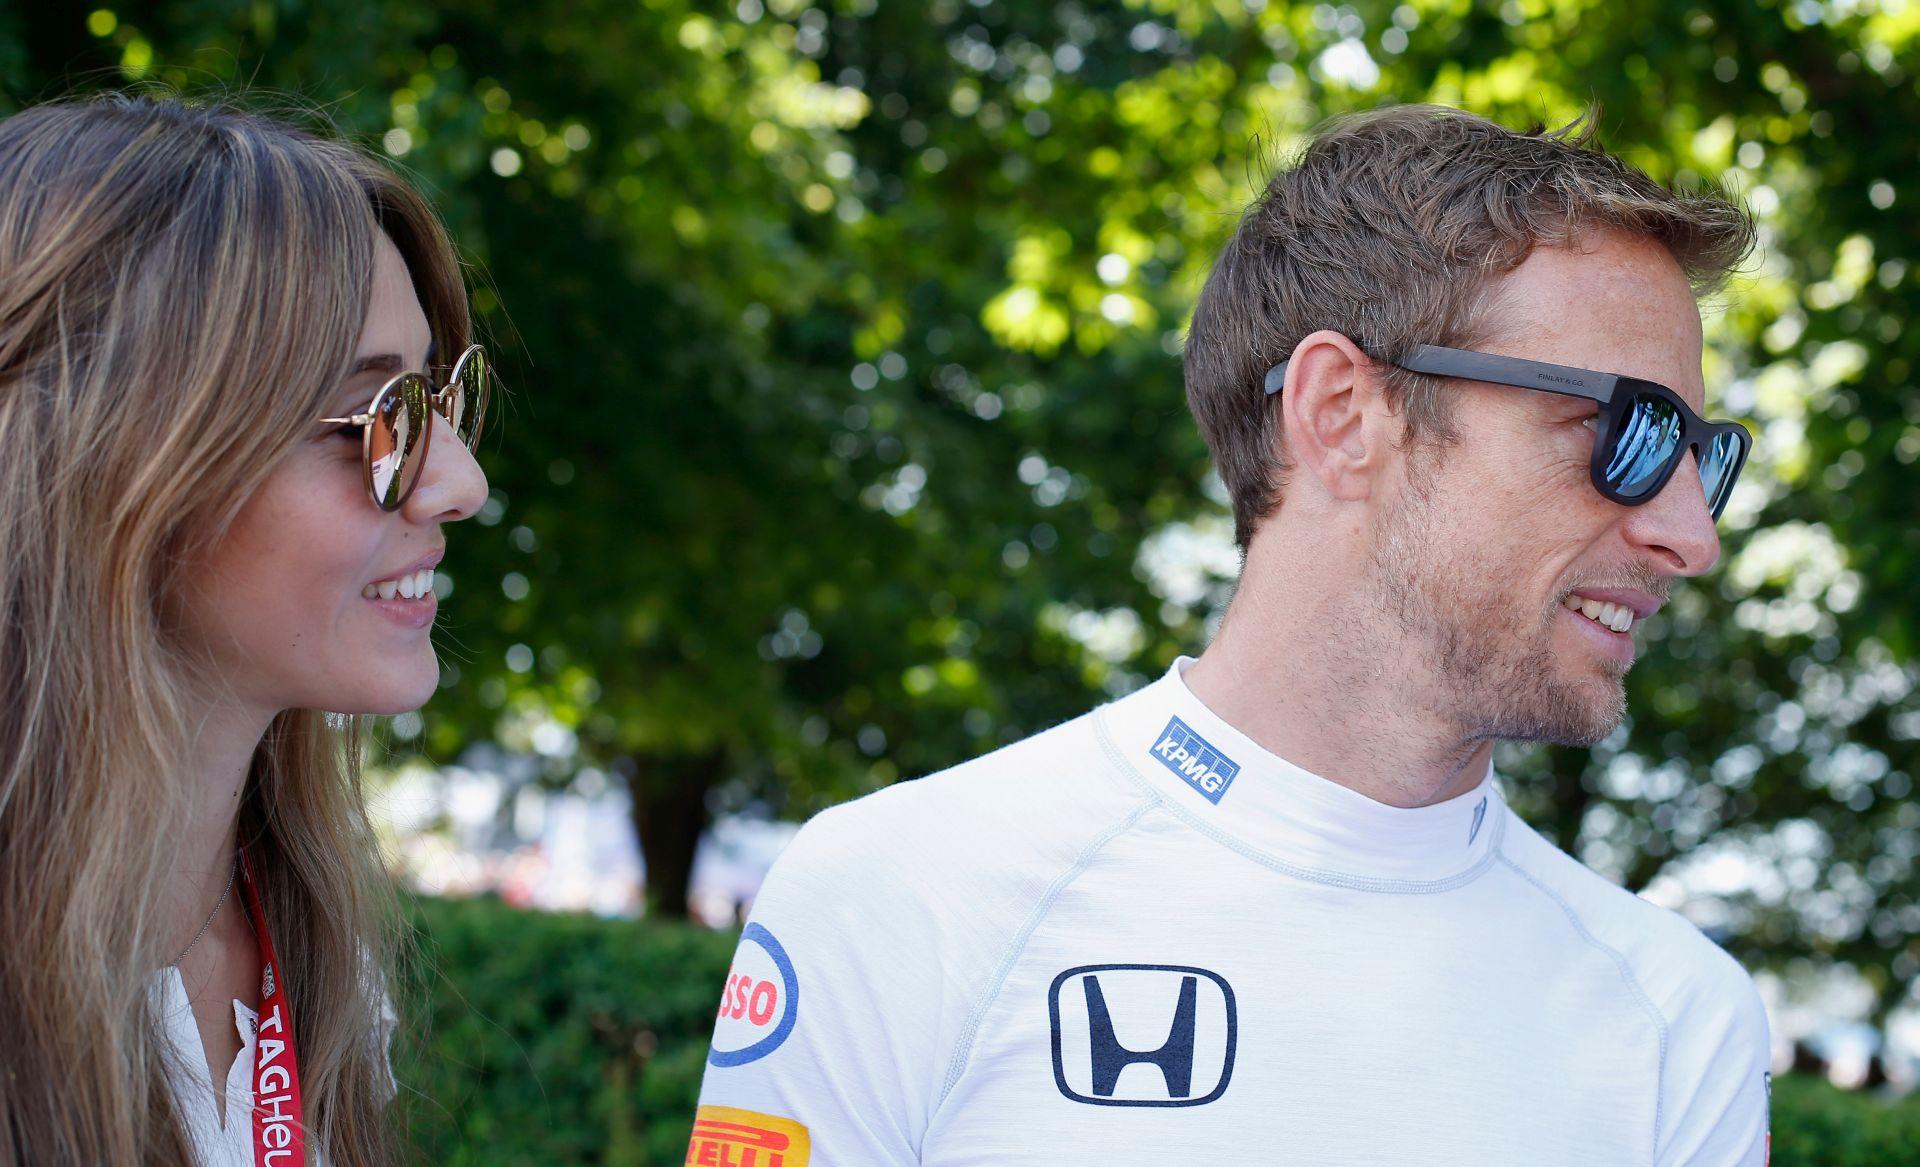 OMAMILI IH PLINOM Vozač Formule Jenson Button pokraden u St. Tropezu